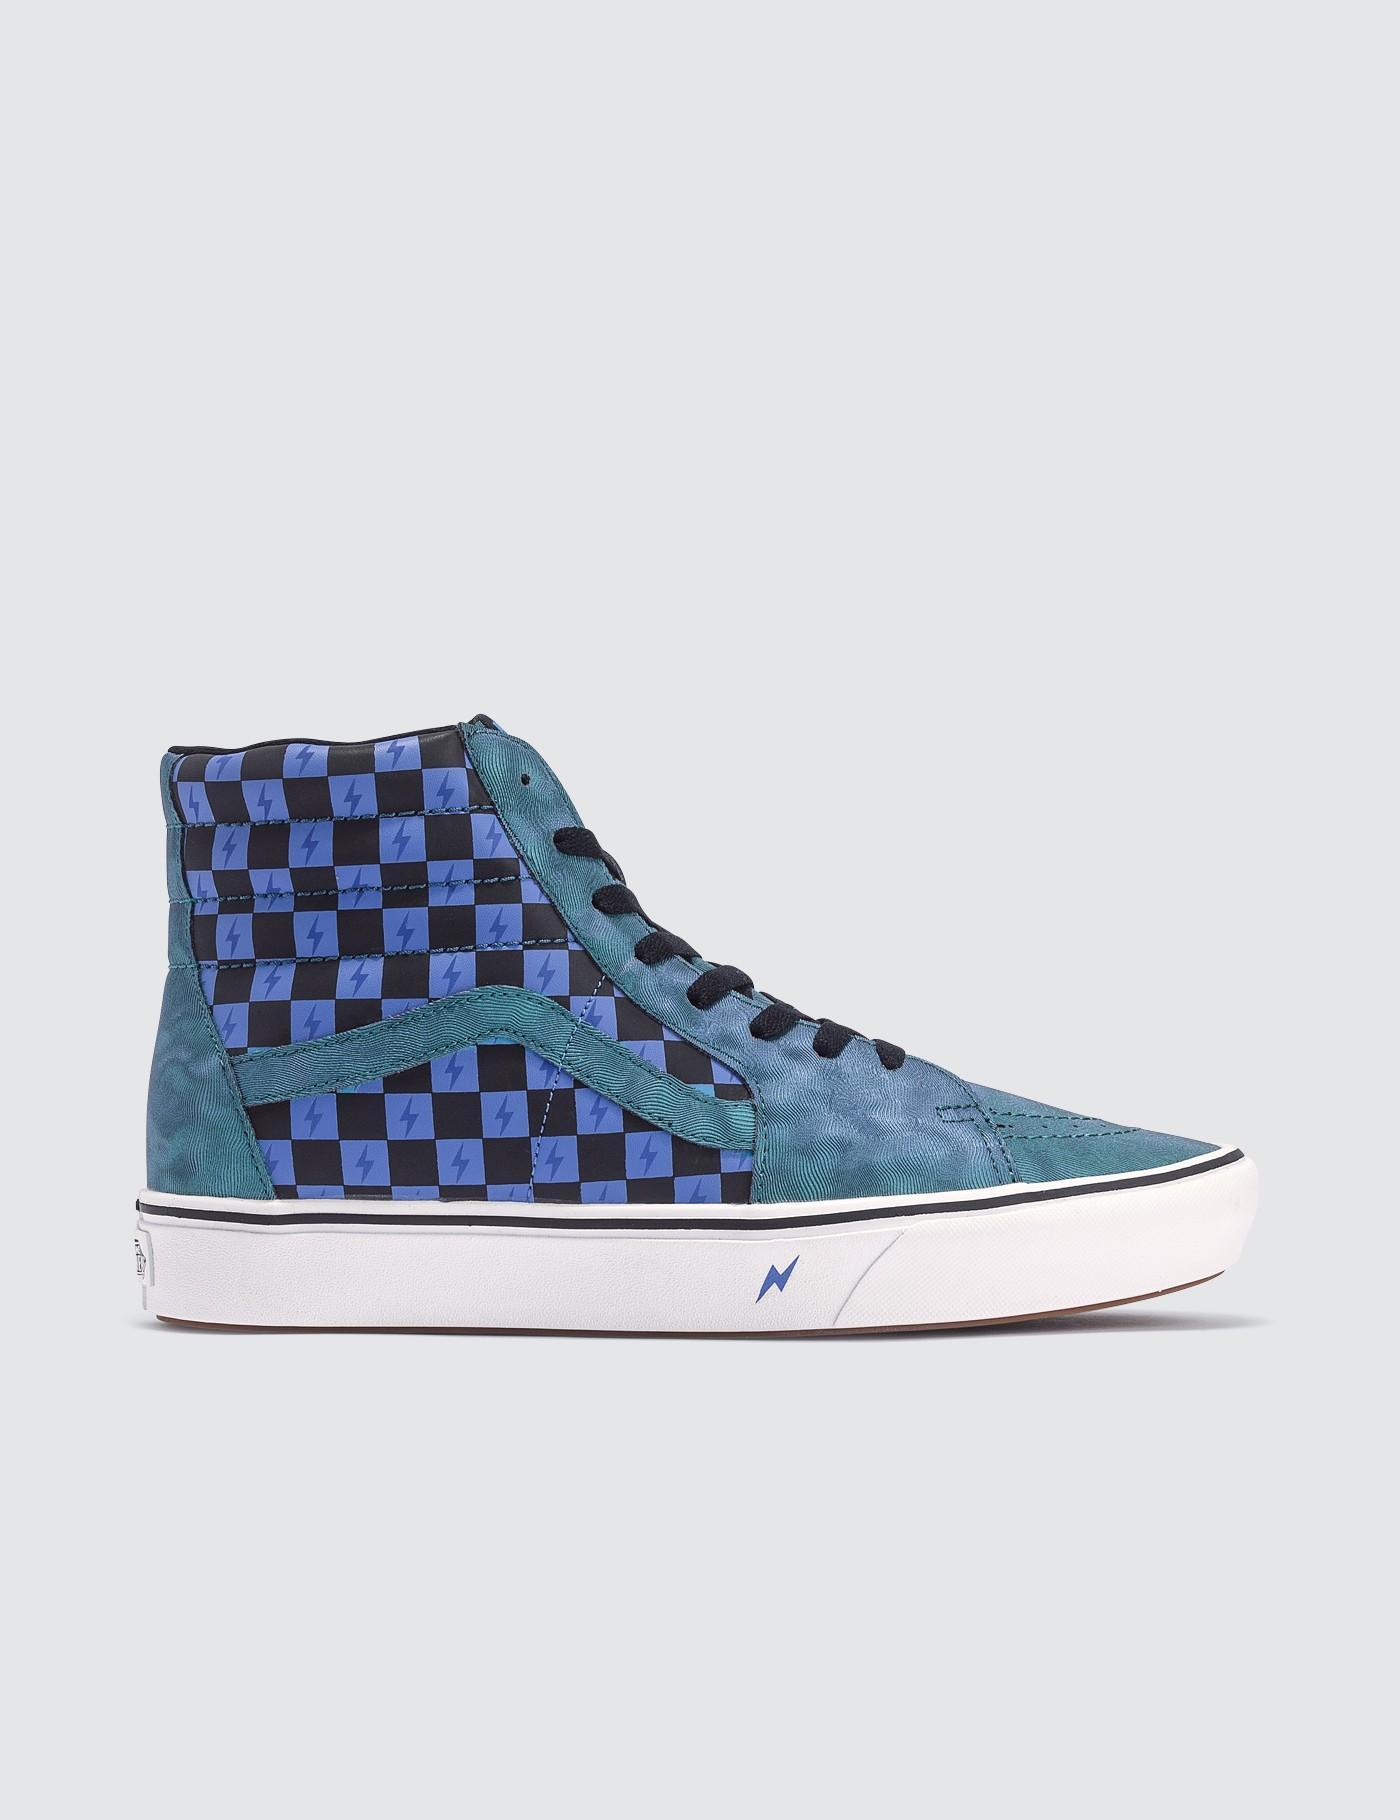 Vans x Harry Potter Unisex Comfycush Sk8 Hi Shoes,TransfigurationTue WihteBlue